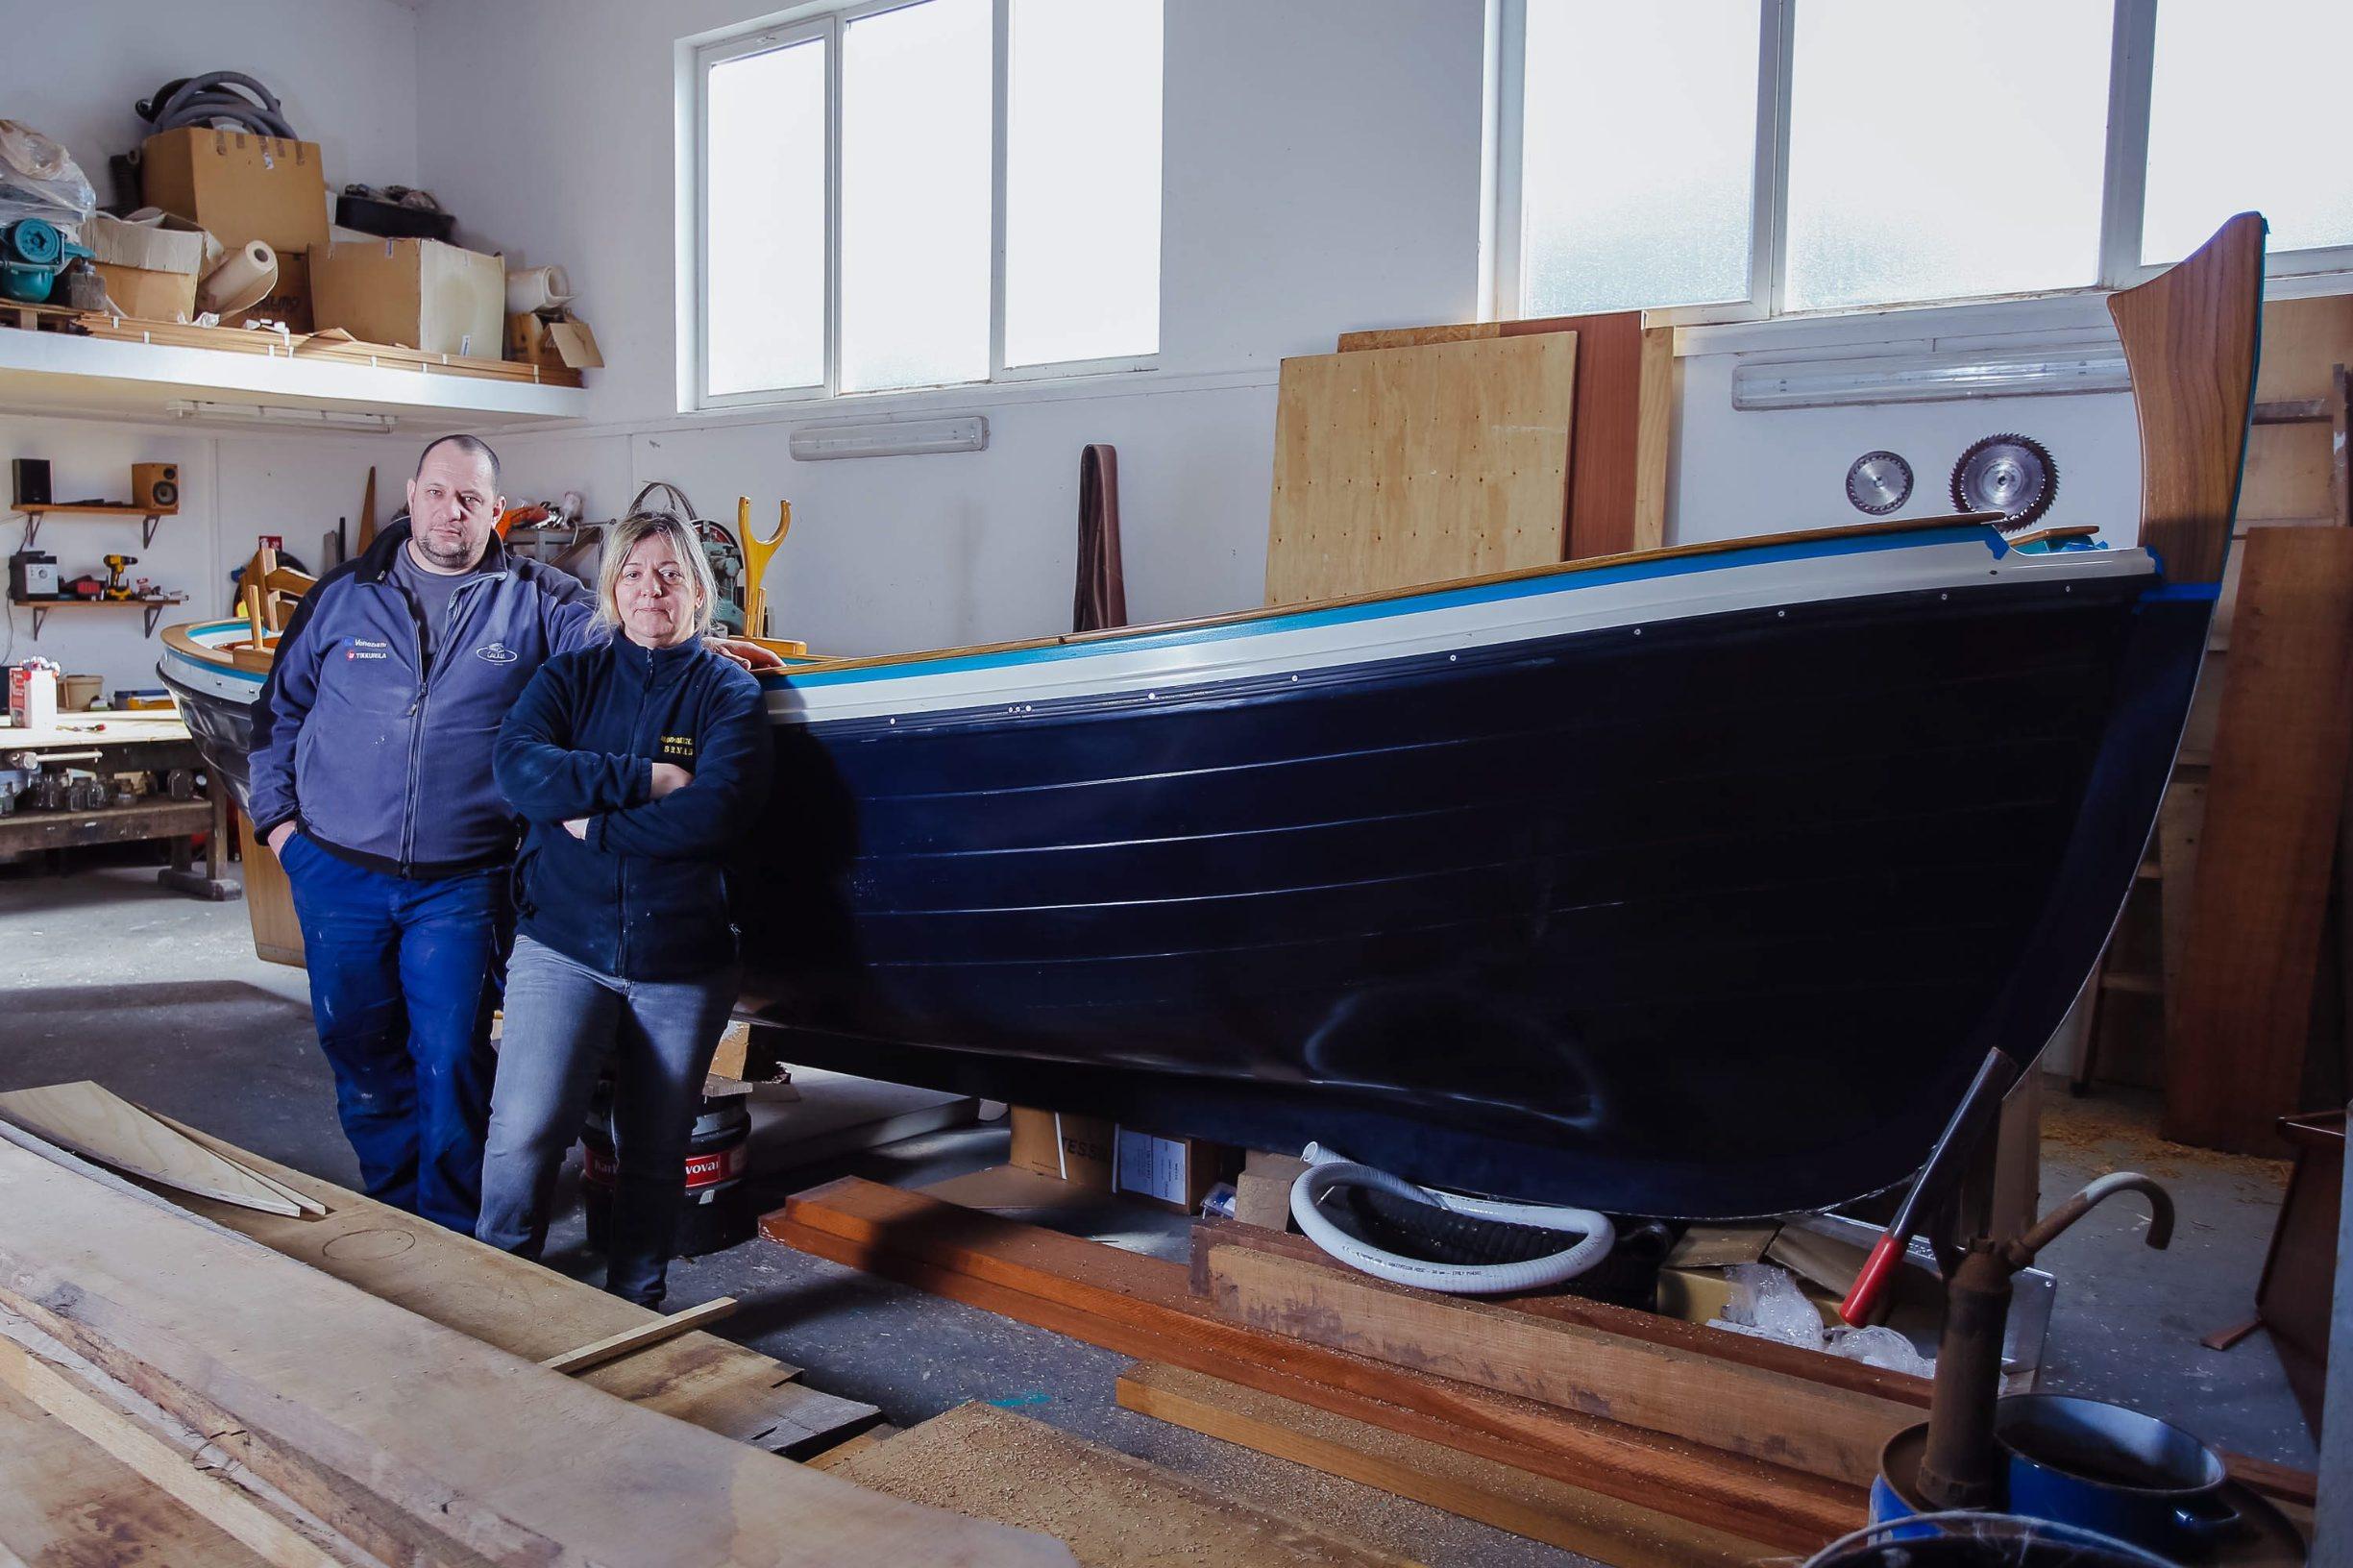 Rab, 150219. Brodograditelji Denis i Marina Brnabic. Na fotografiji: Denis i Marina Brnabic uz brod Sampa 6. Foto: Marko Todorov / CROPIX